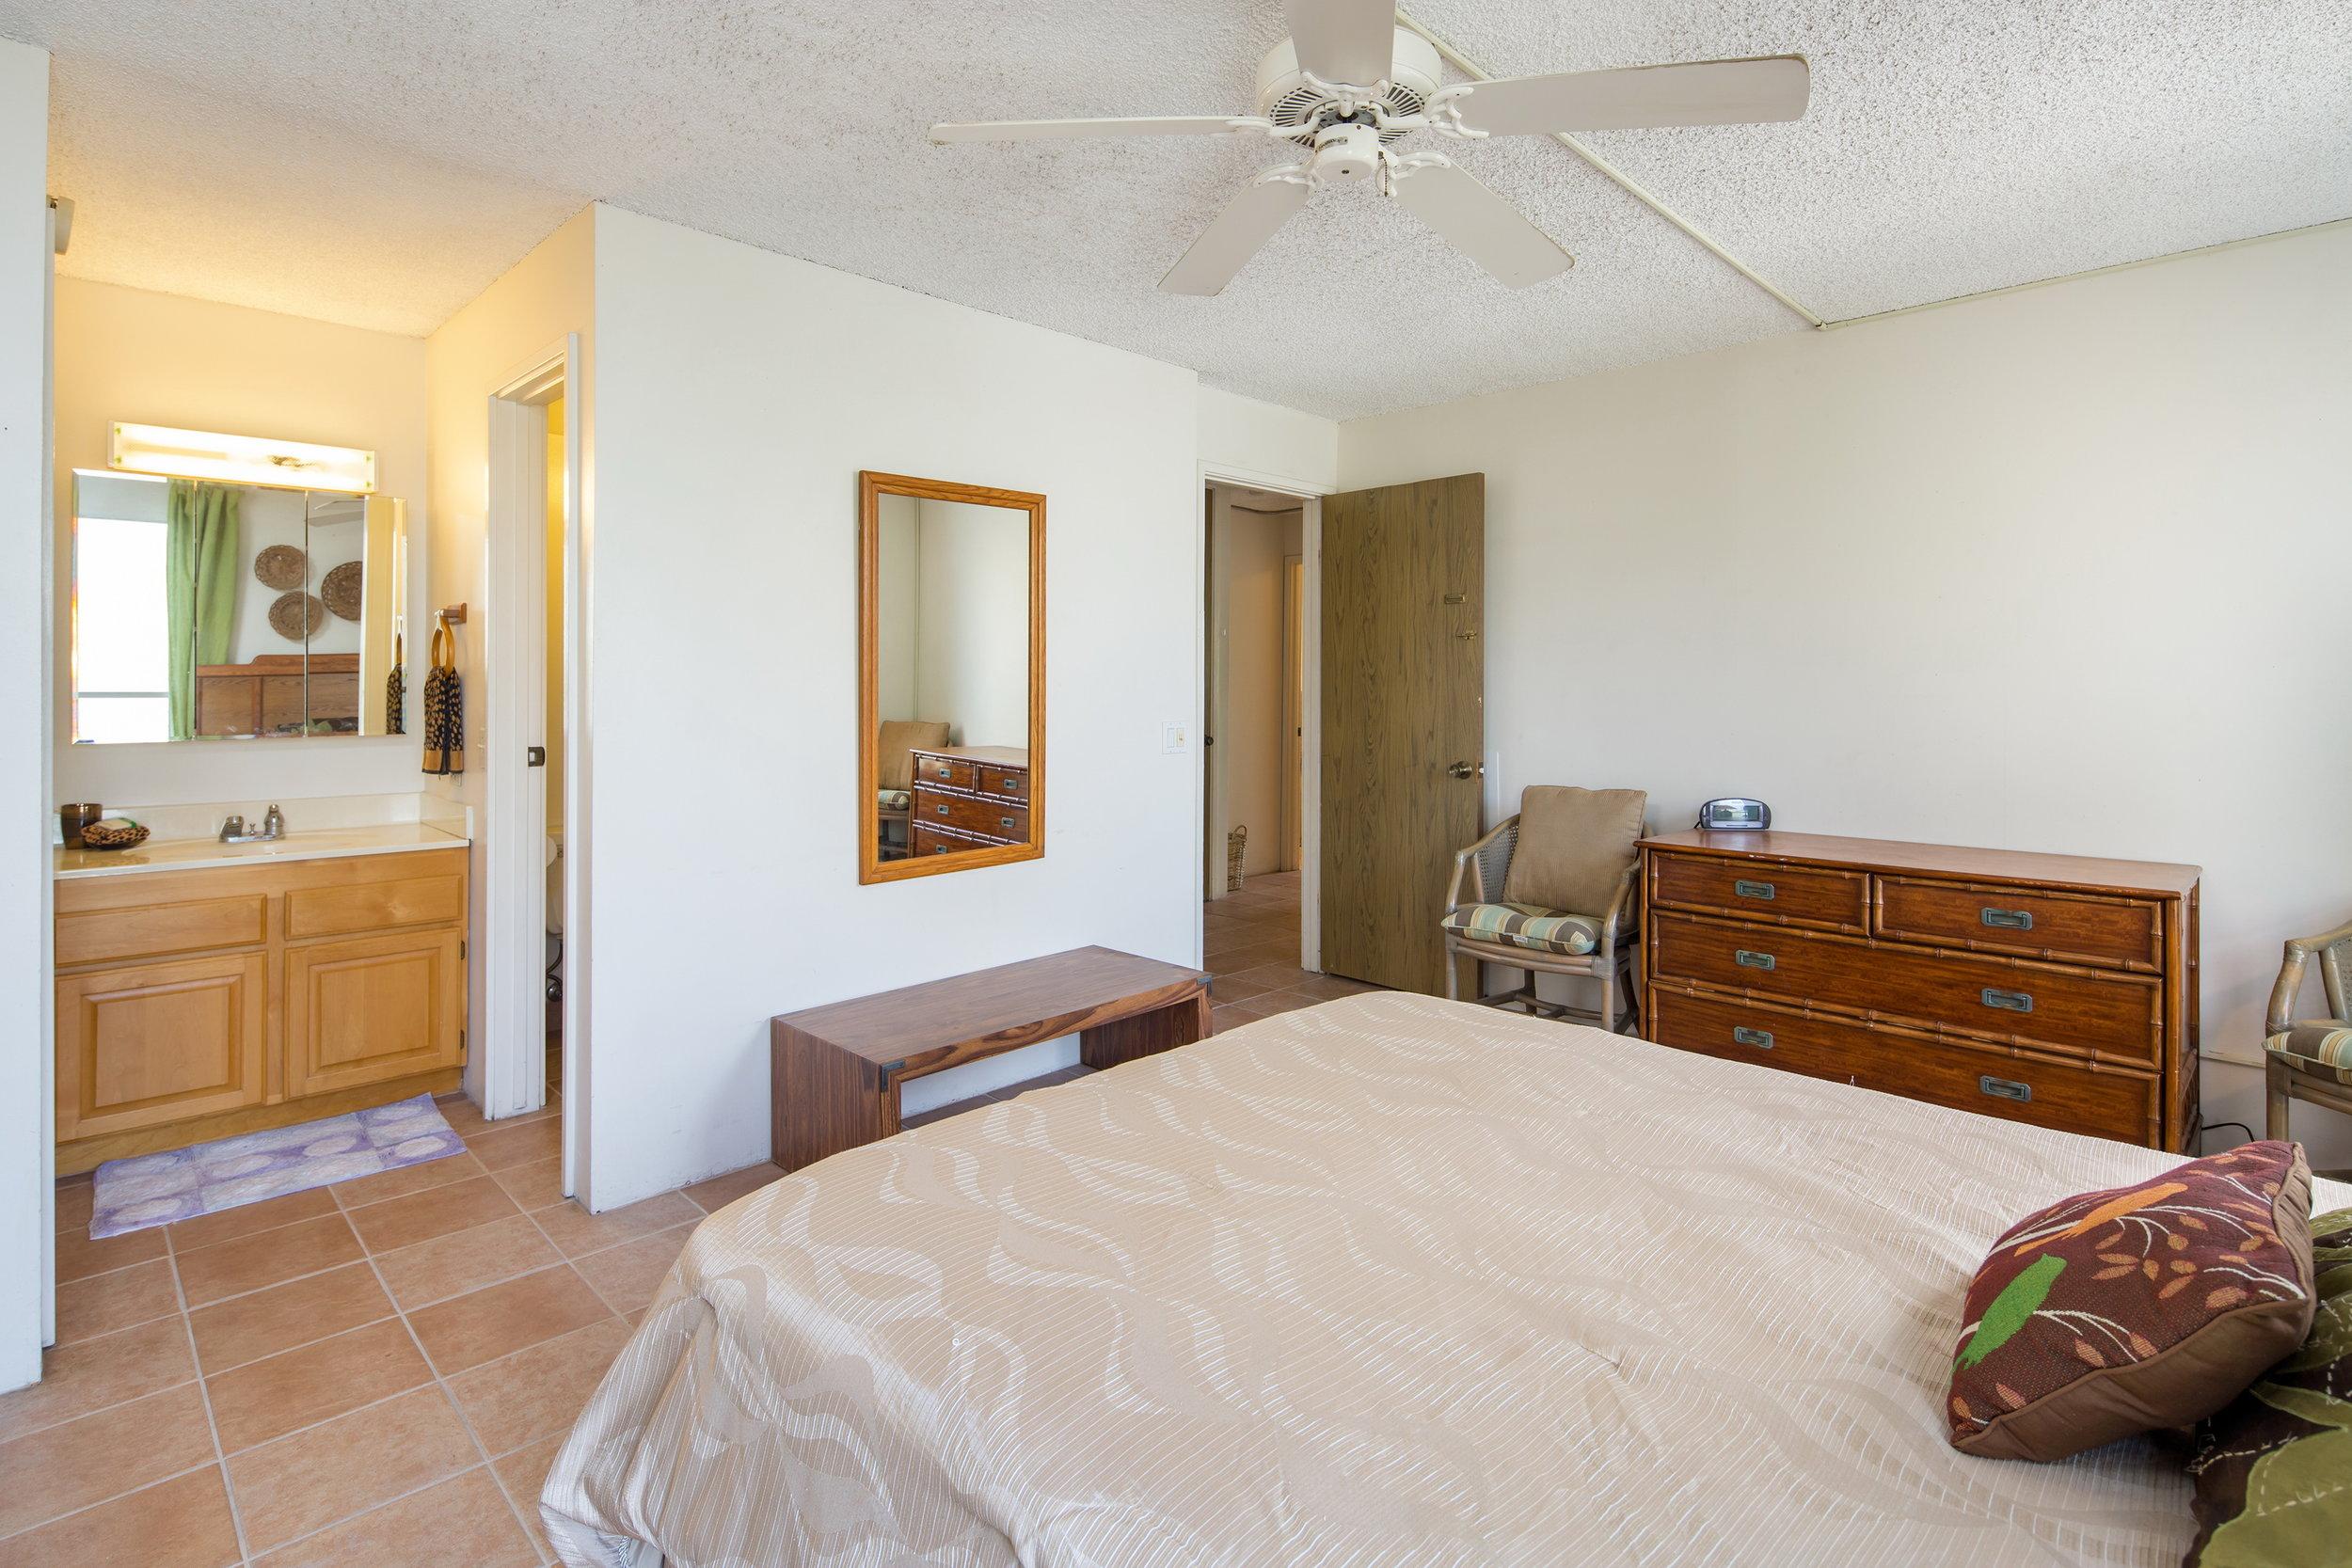 Bedroom 2.4.jpg